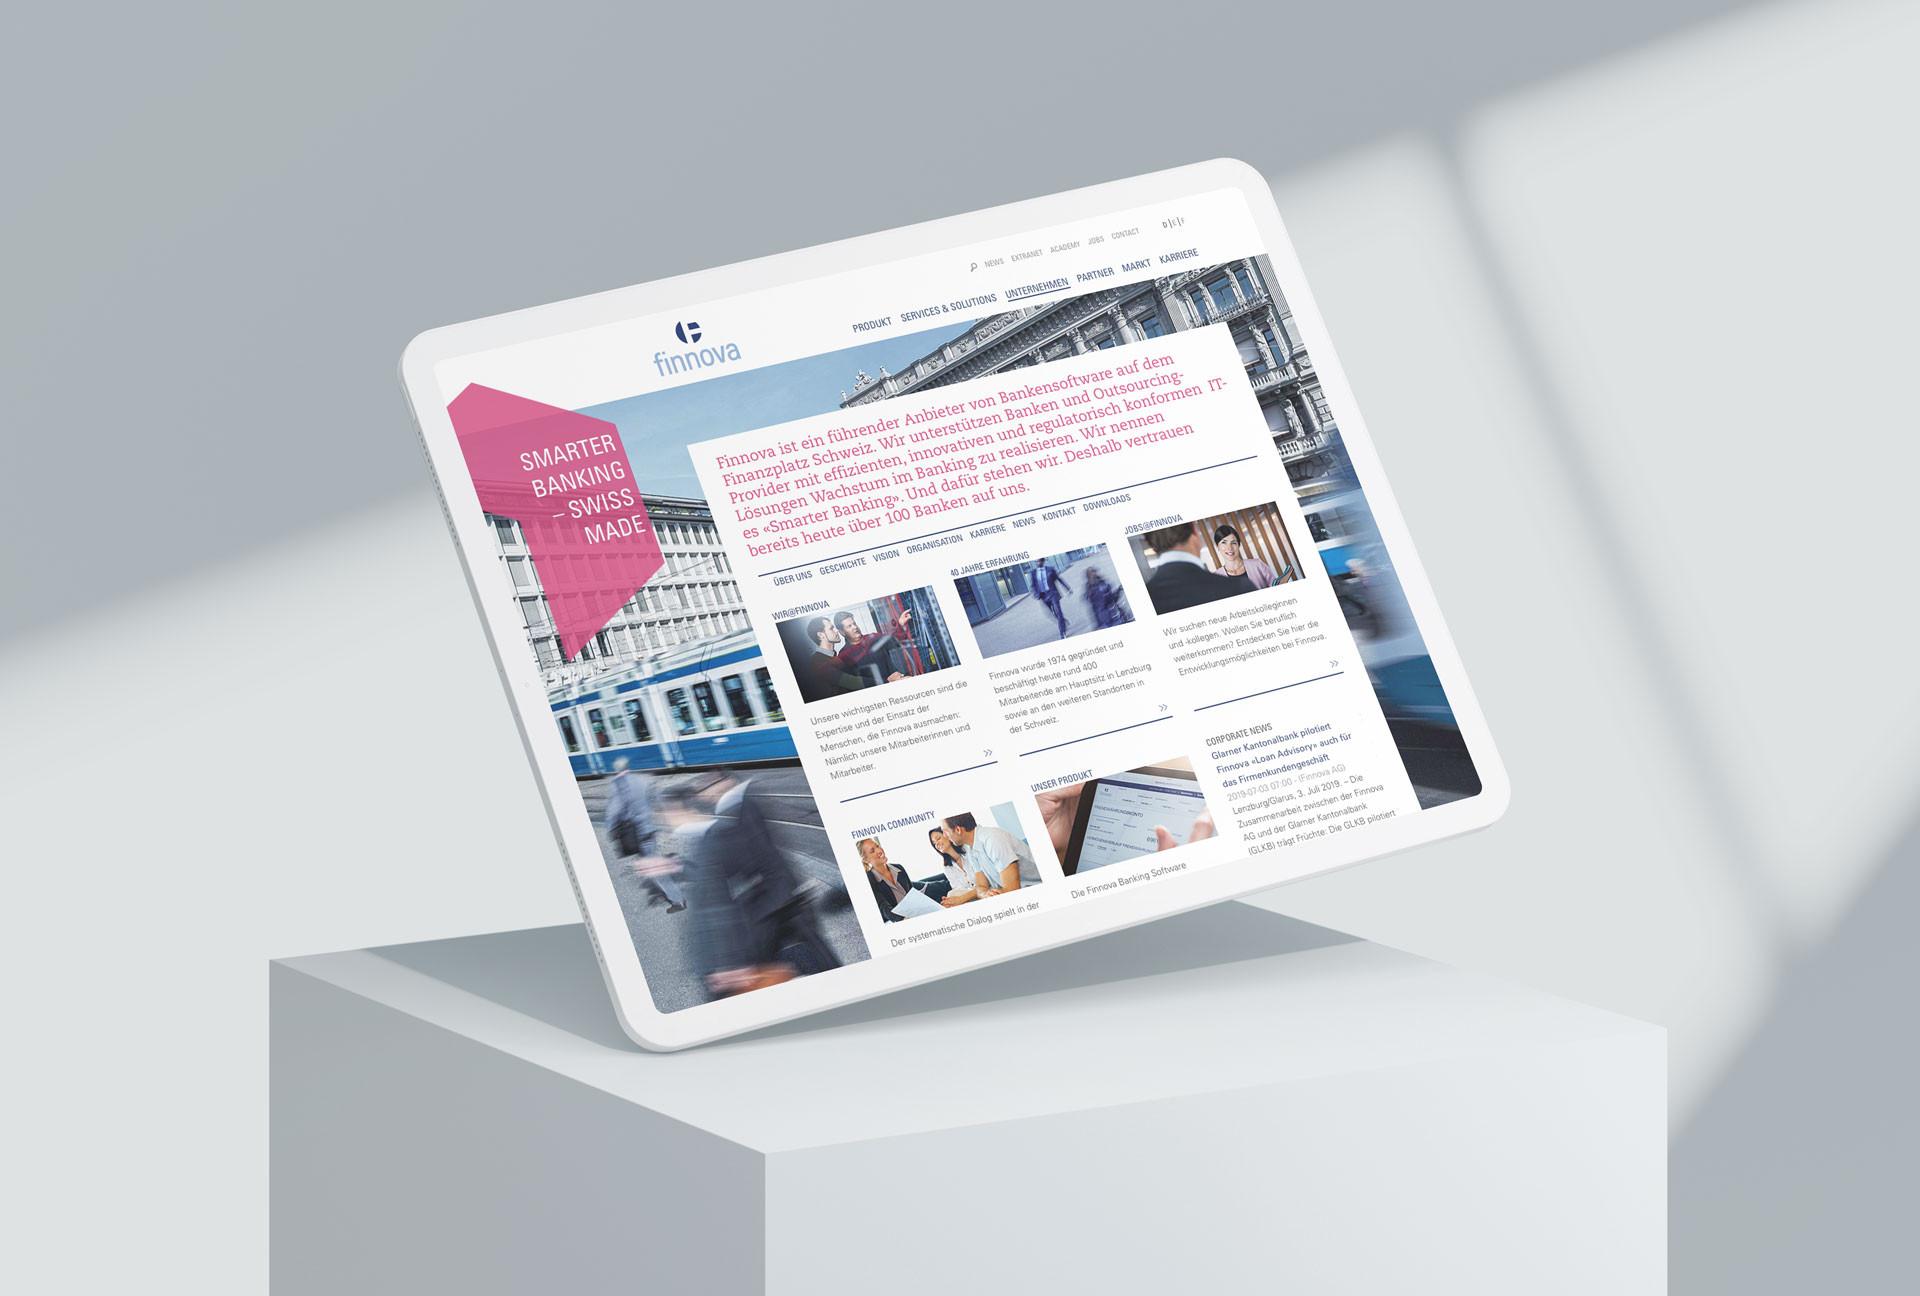 Finnova_iPad_1.jpg